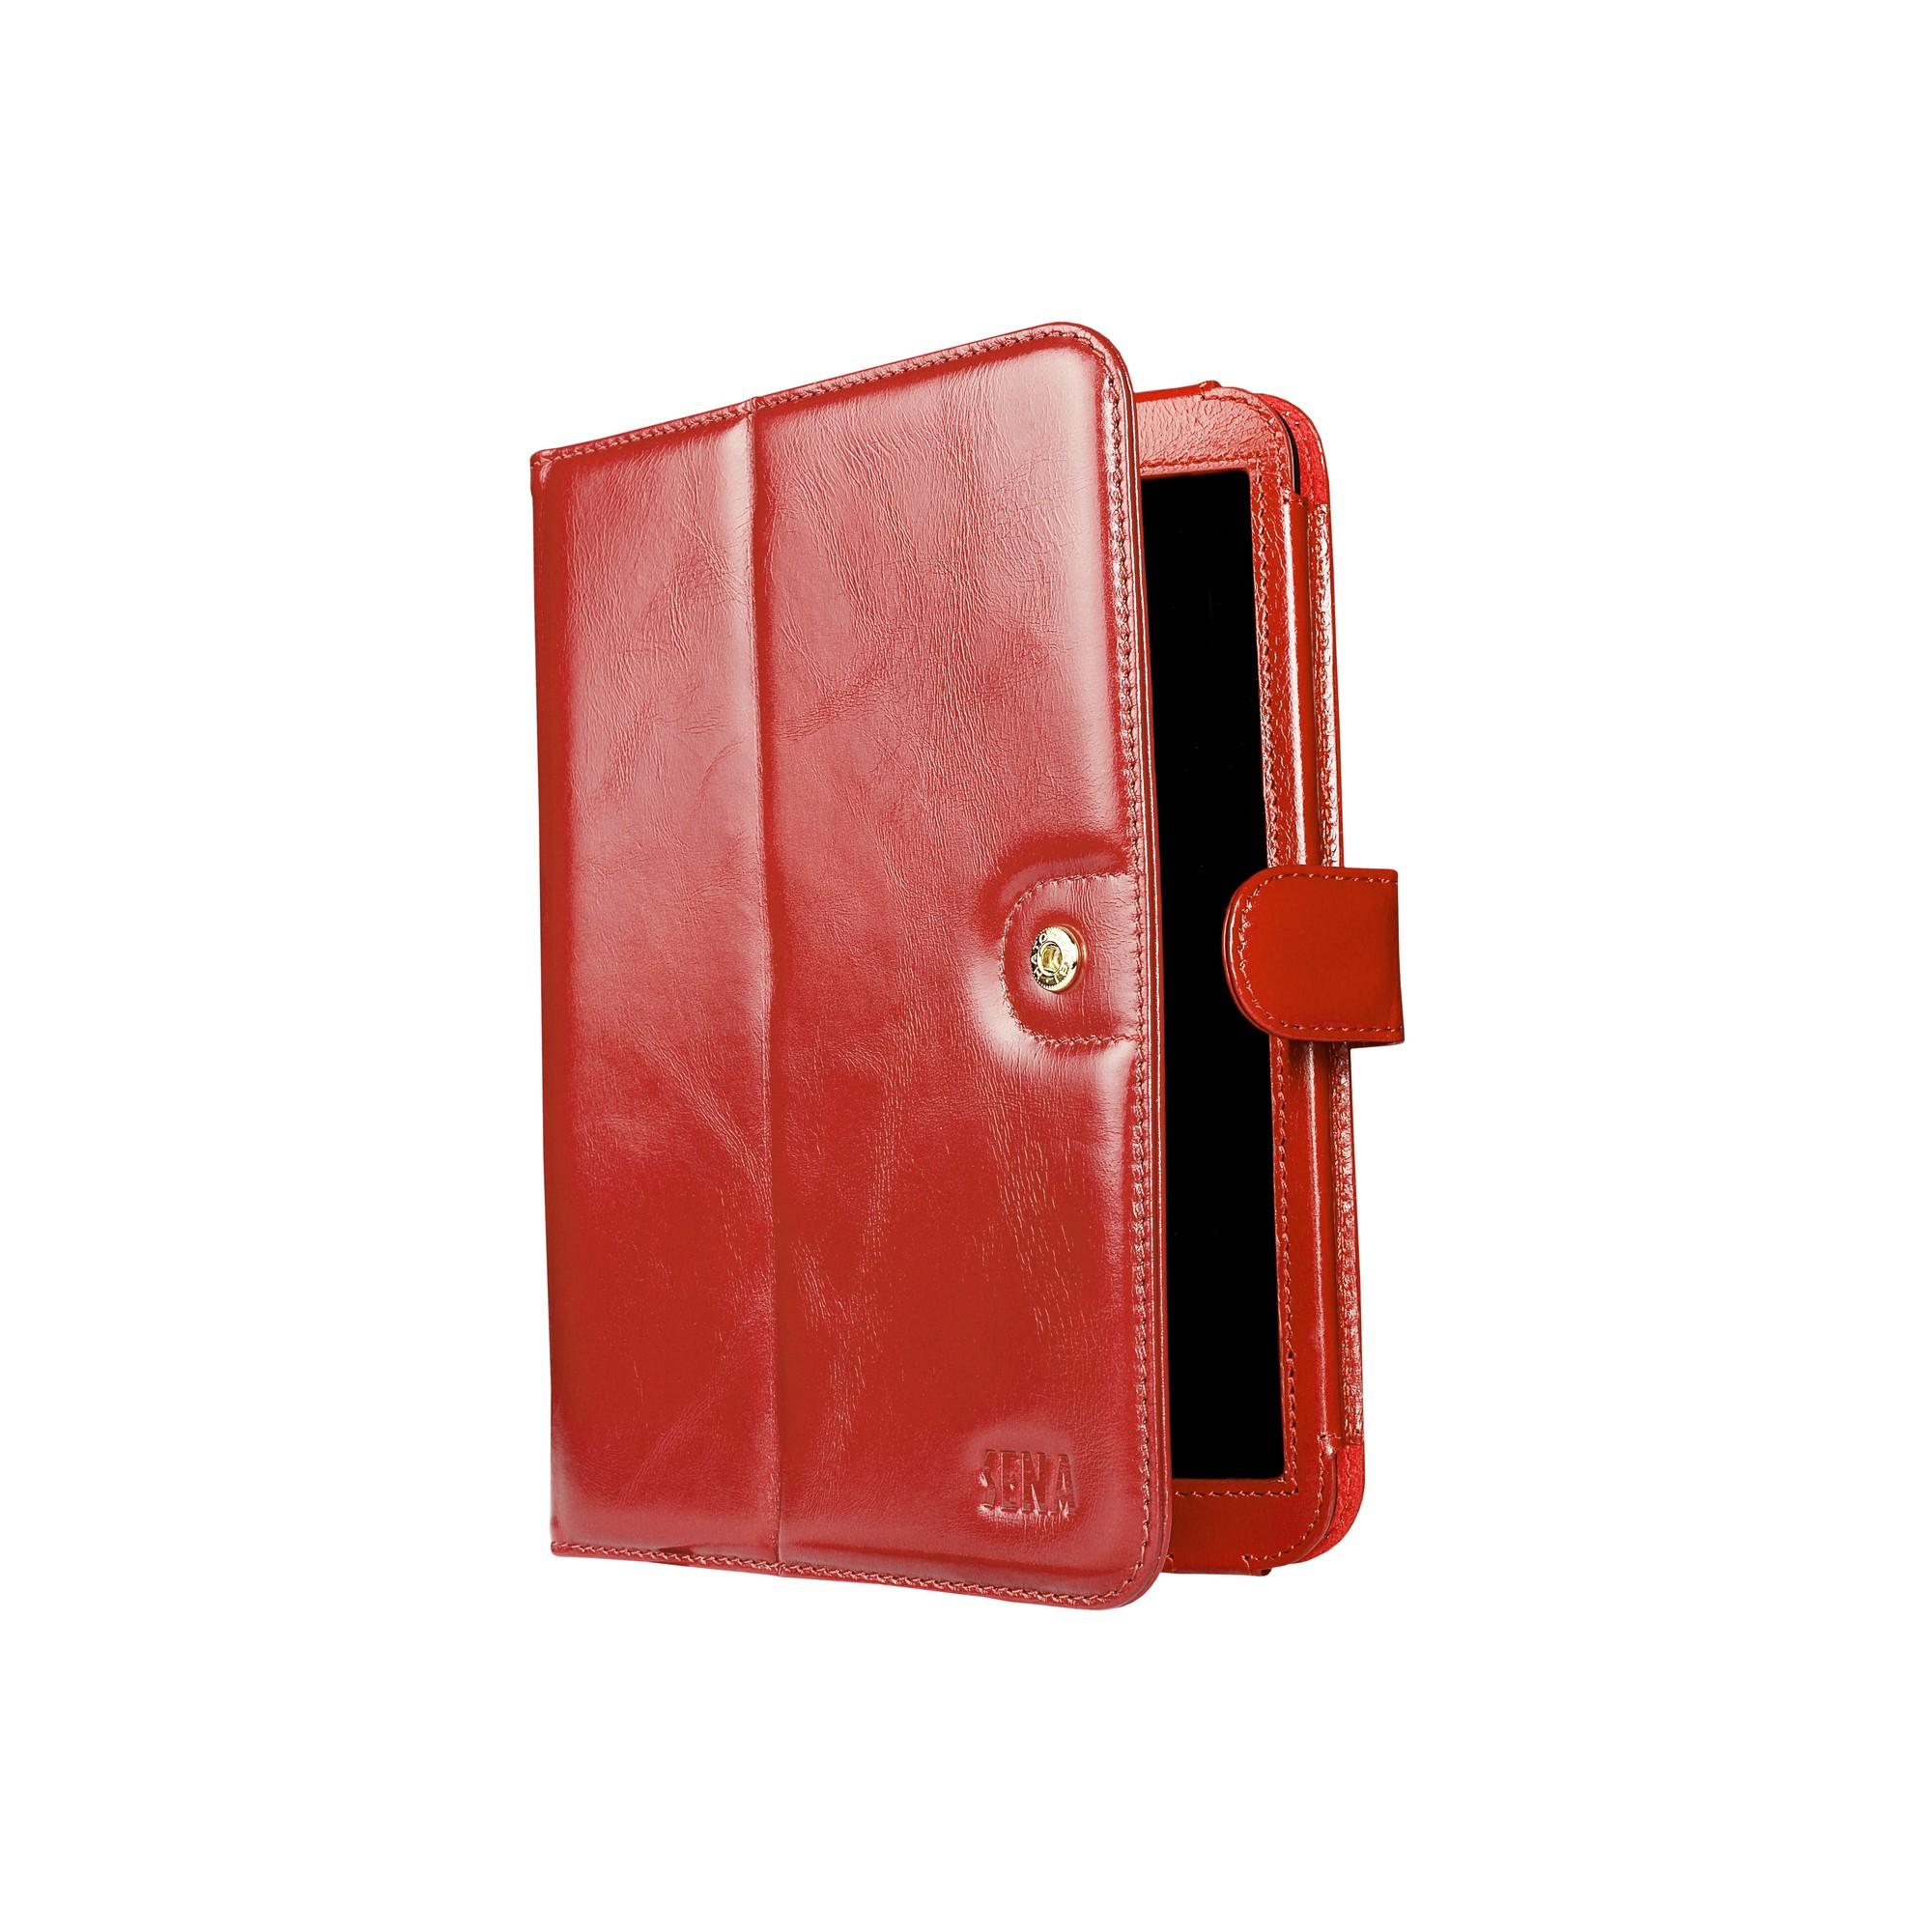 Folio iPad mini 1 / 2 / 3 Red